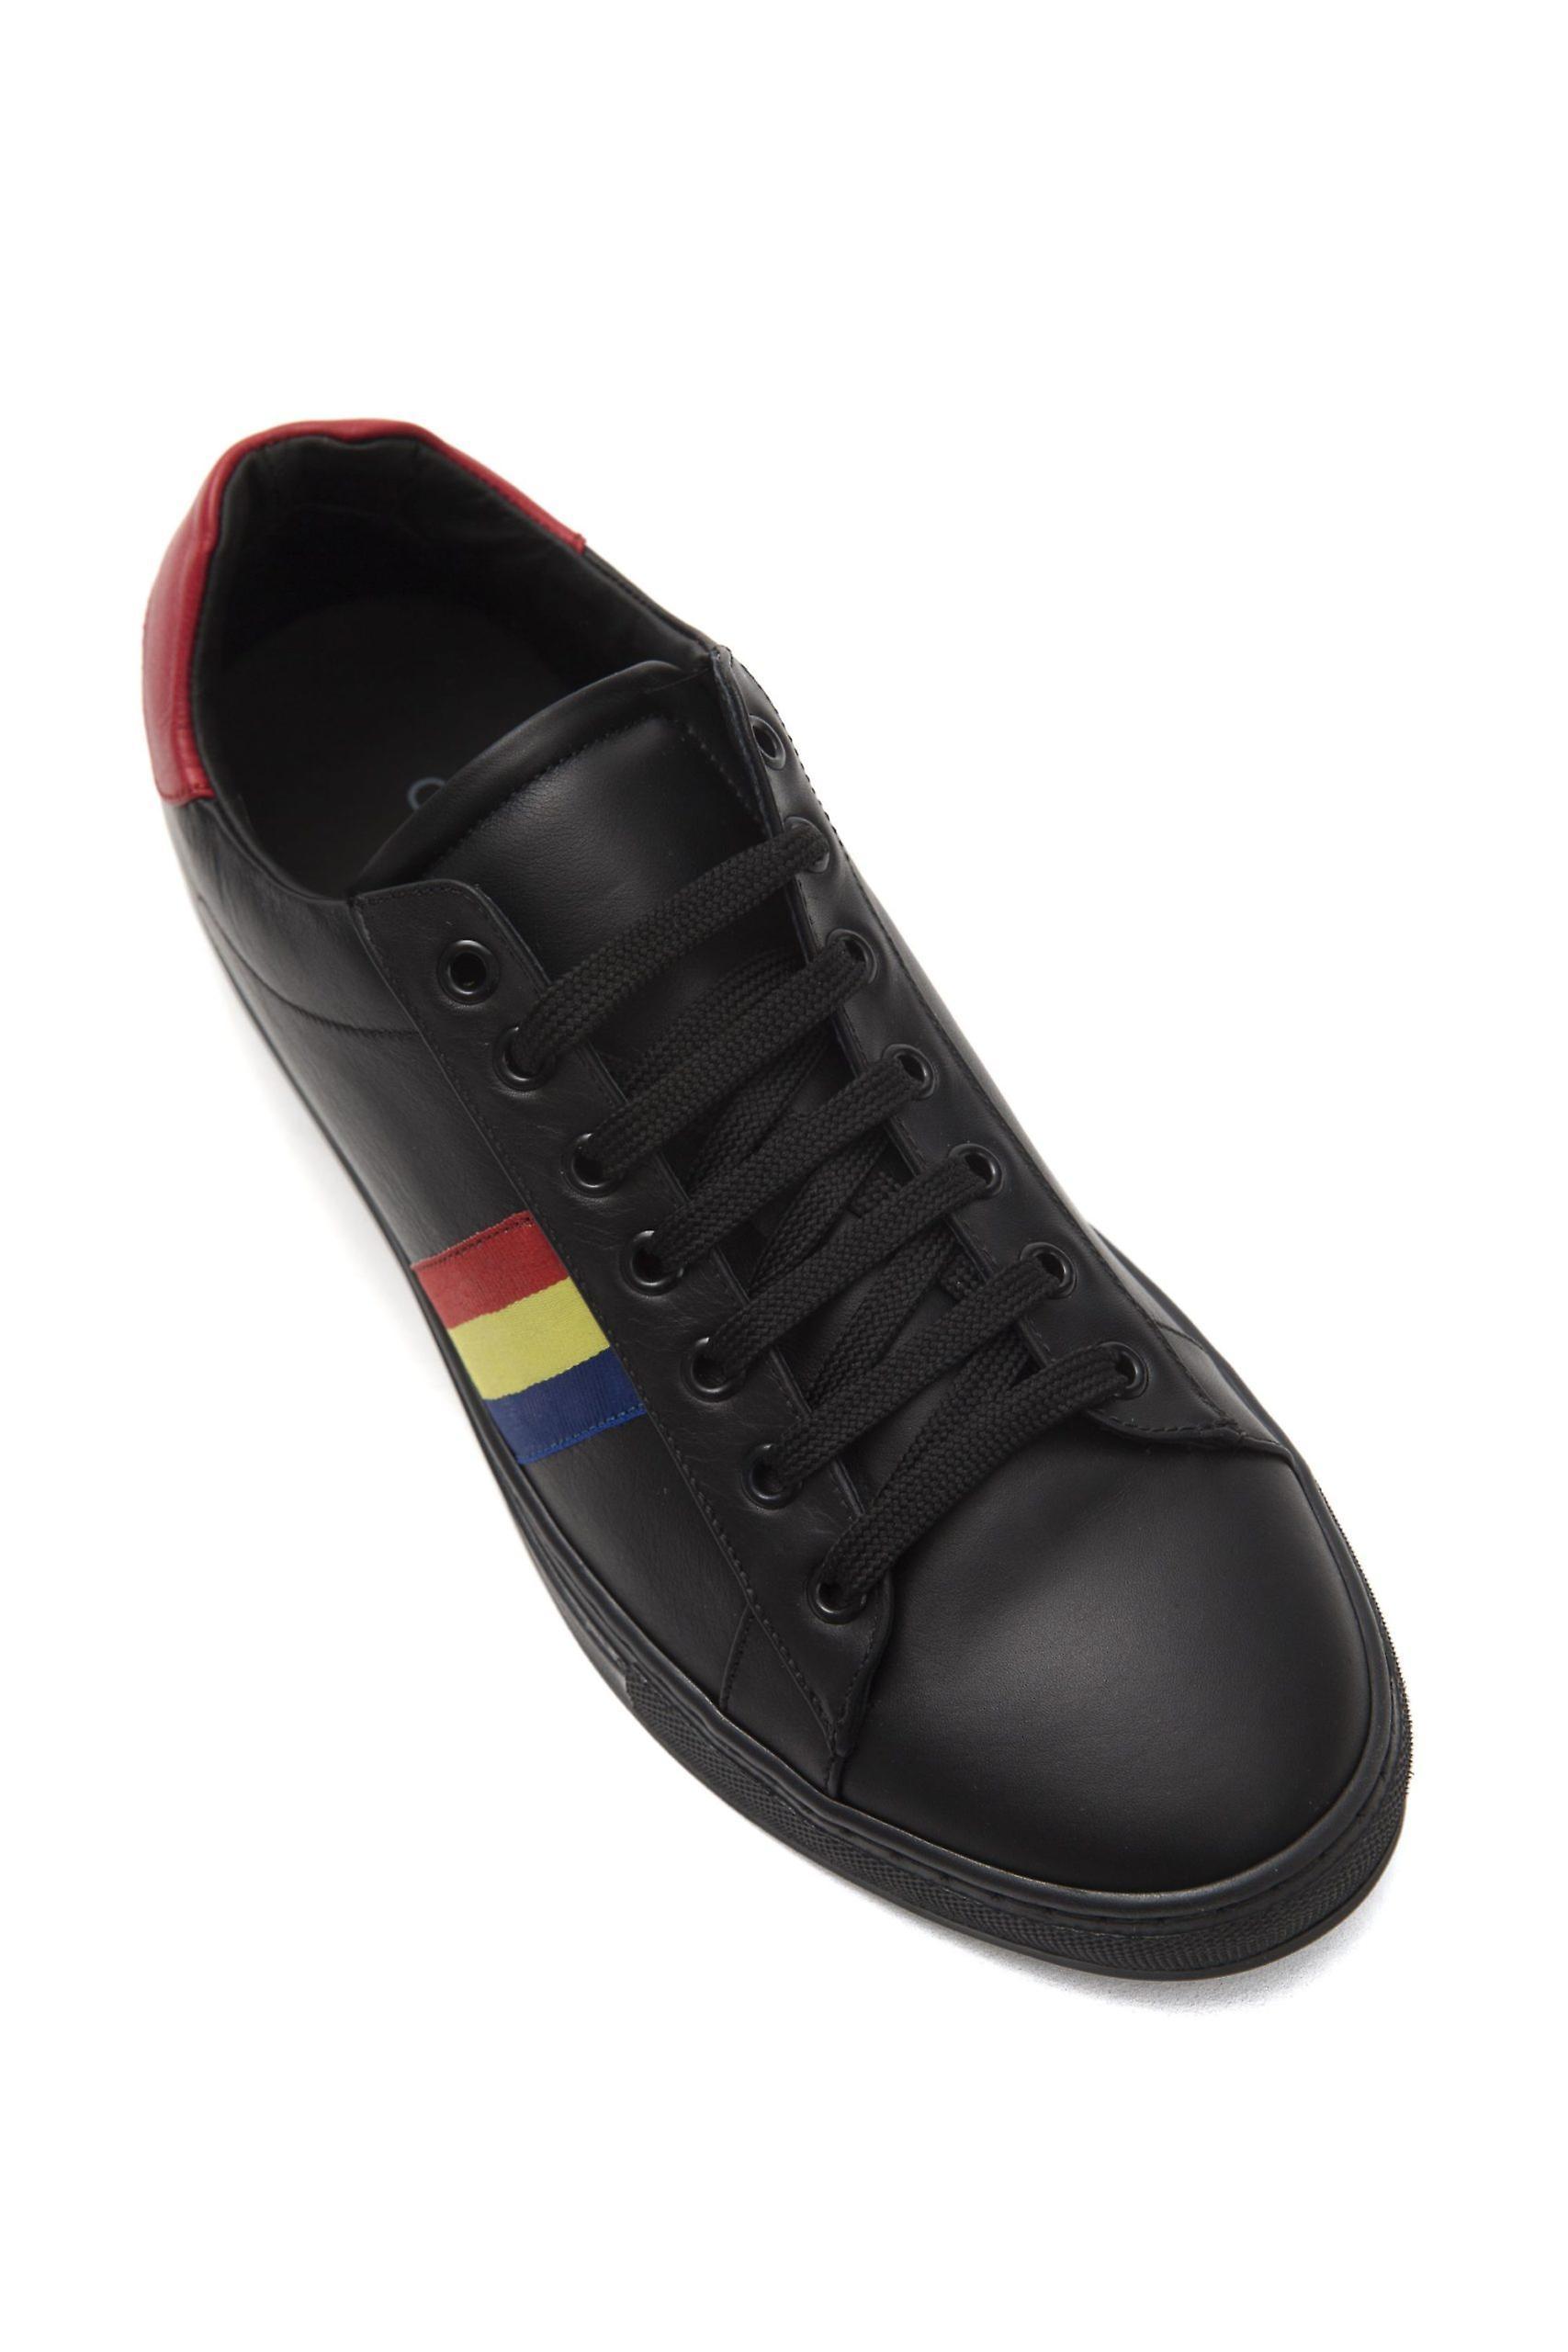 Castelbajac Nero - Ros - Nero Sneakers